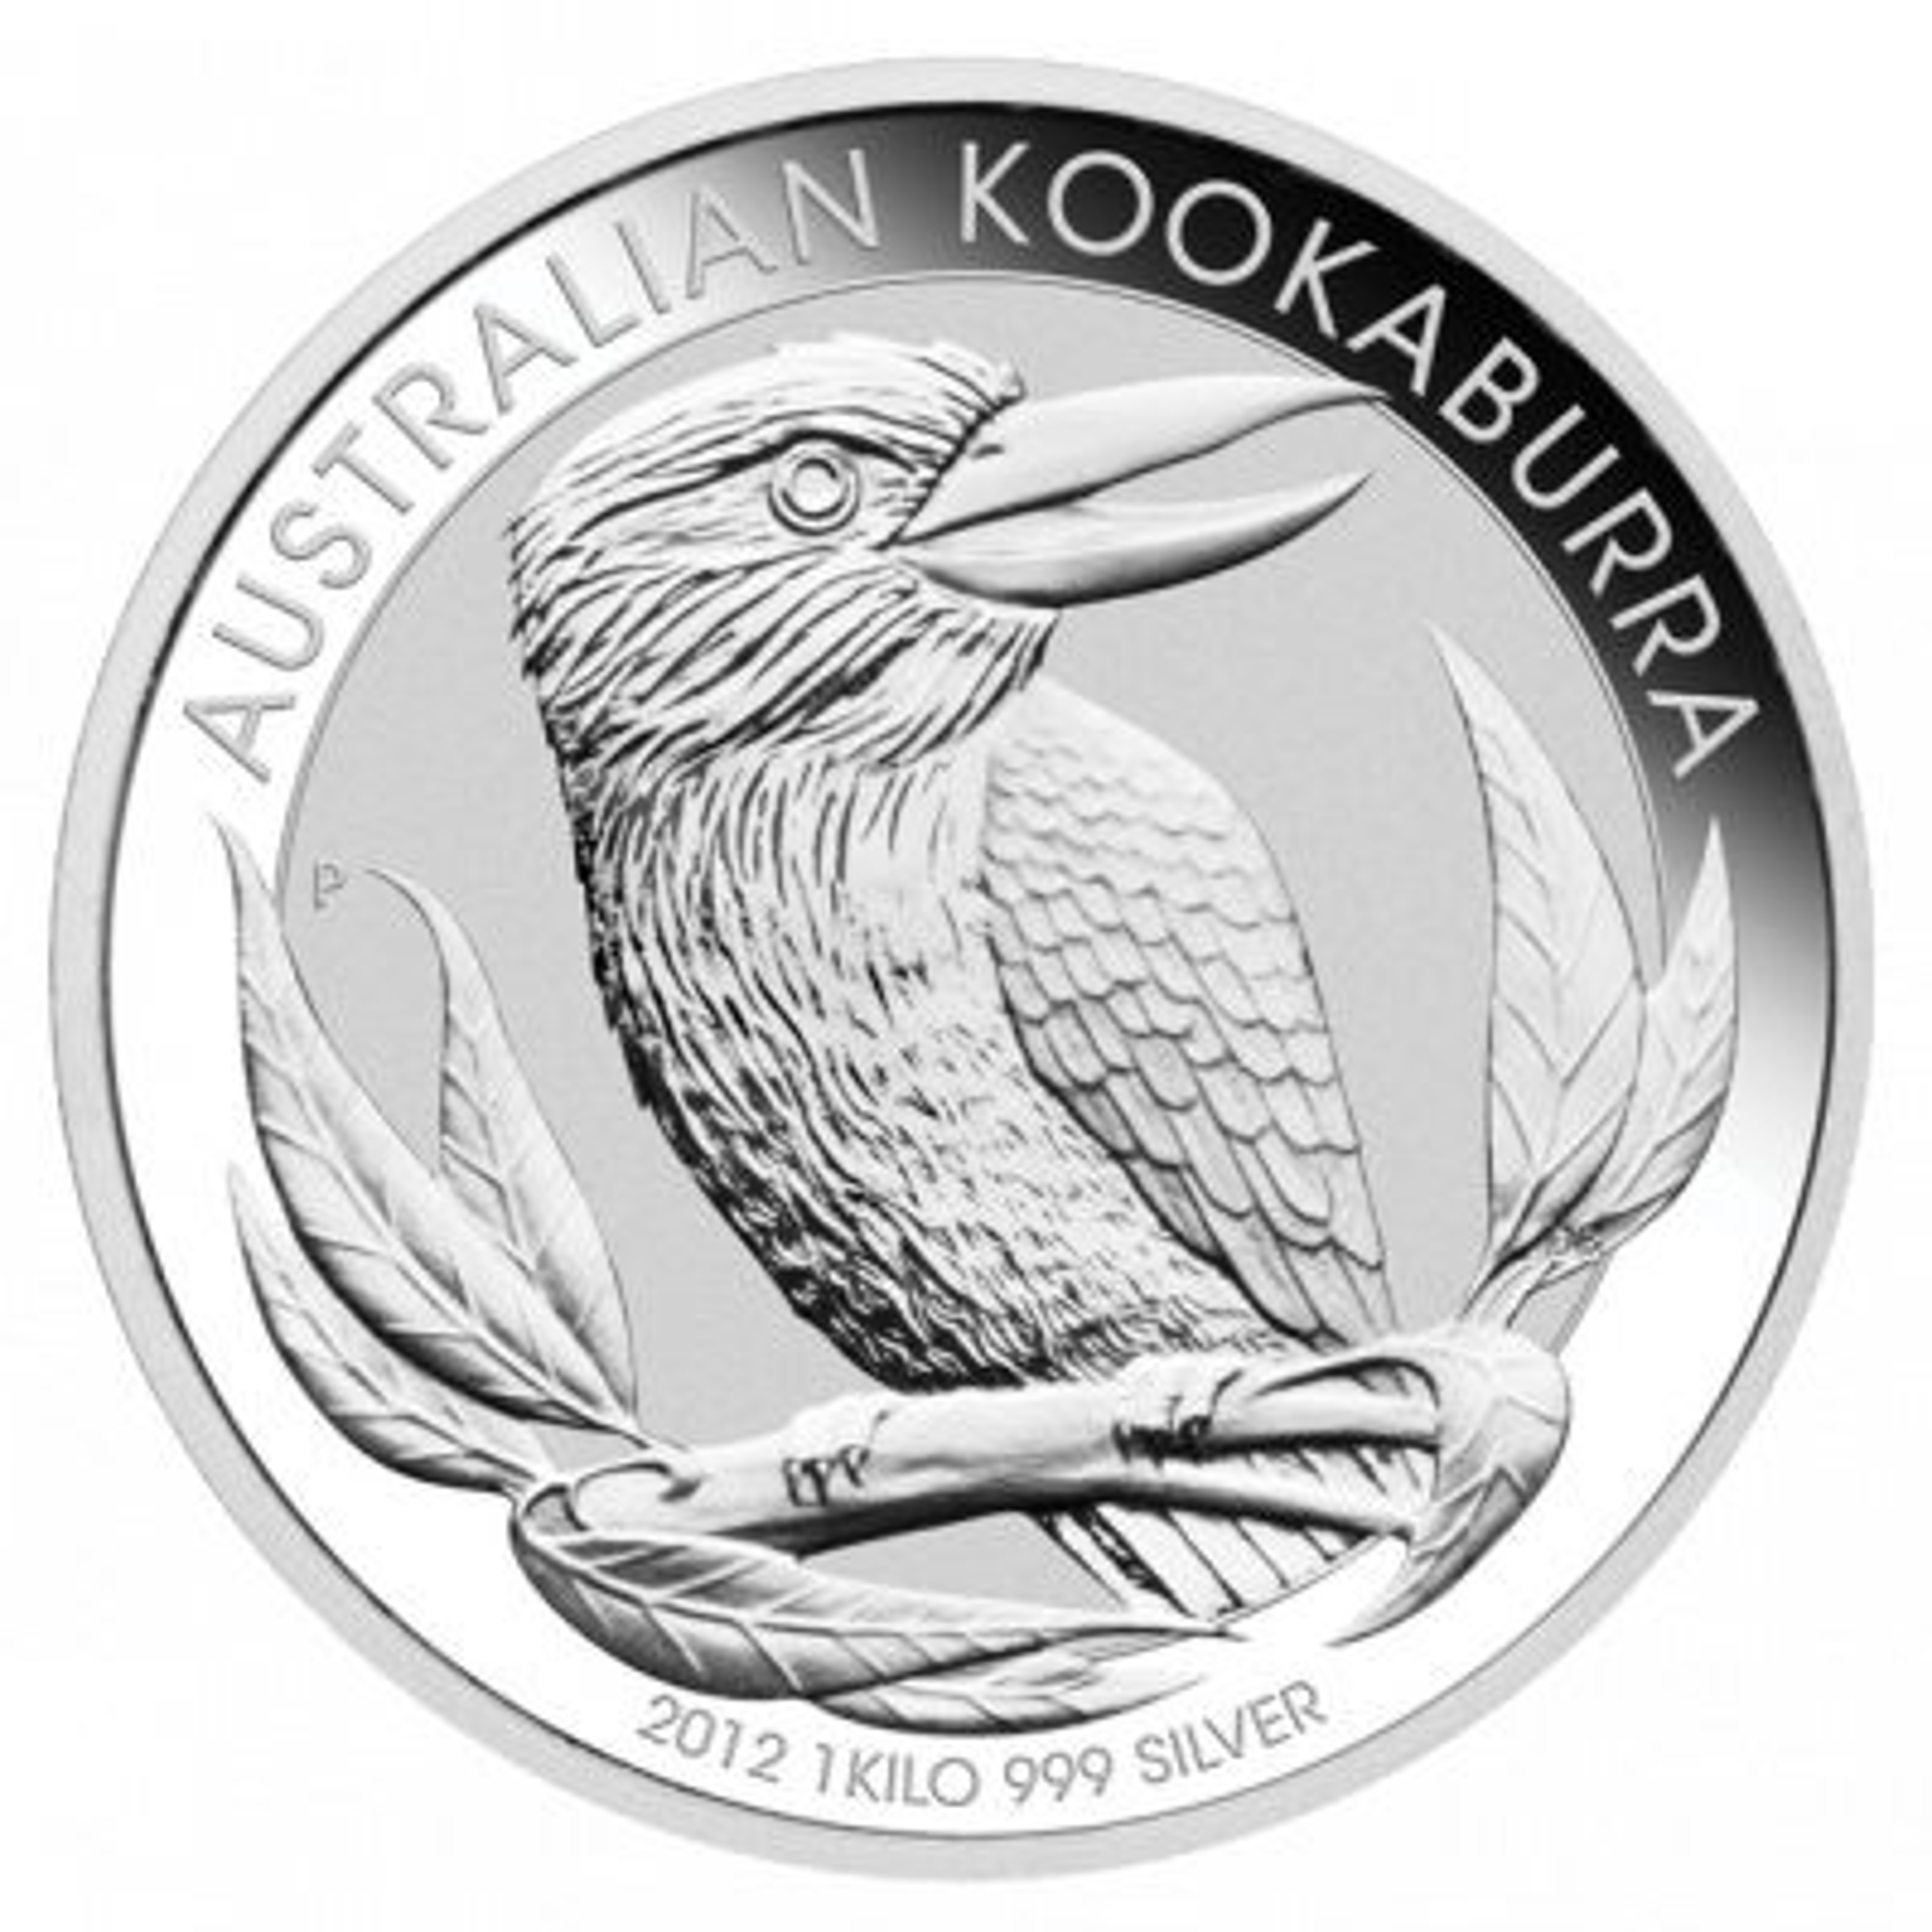 2012 kilo Kookaburra Perth Mint zilver